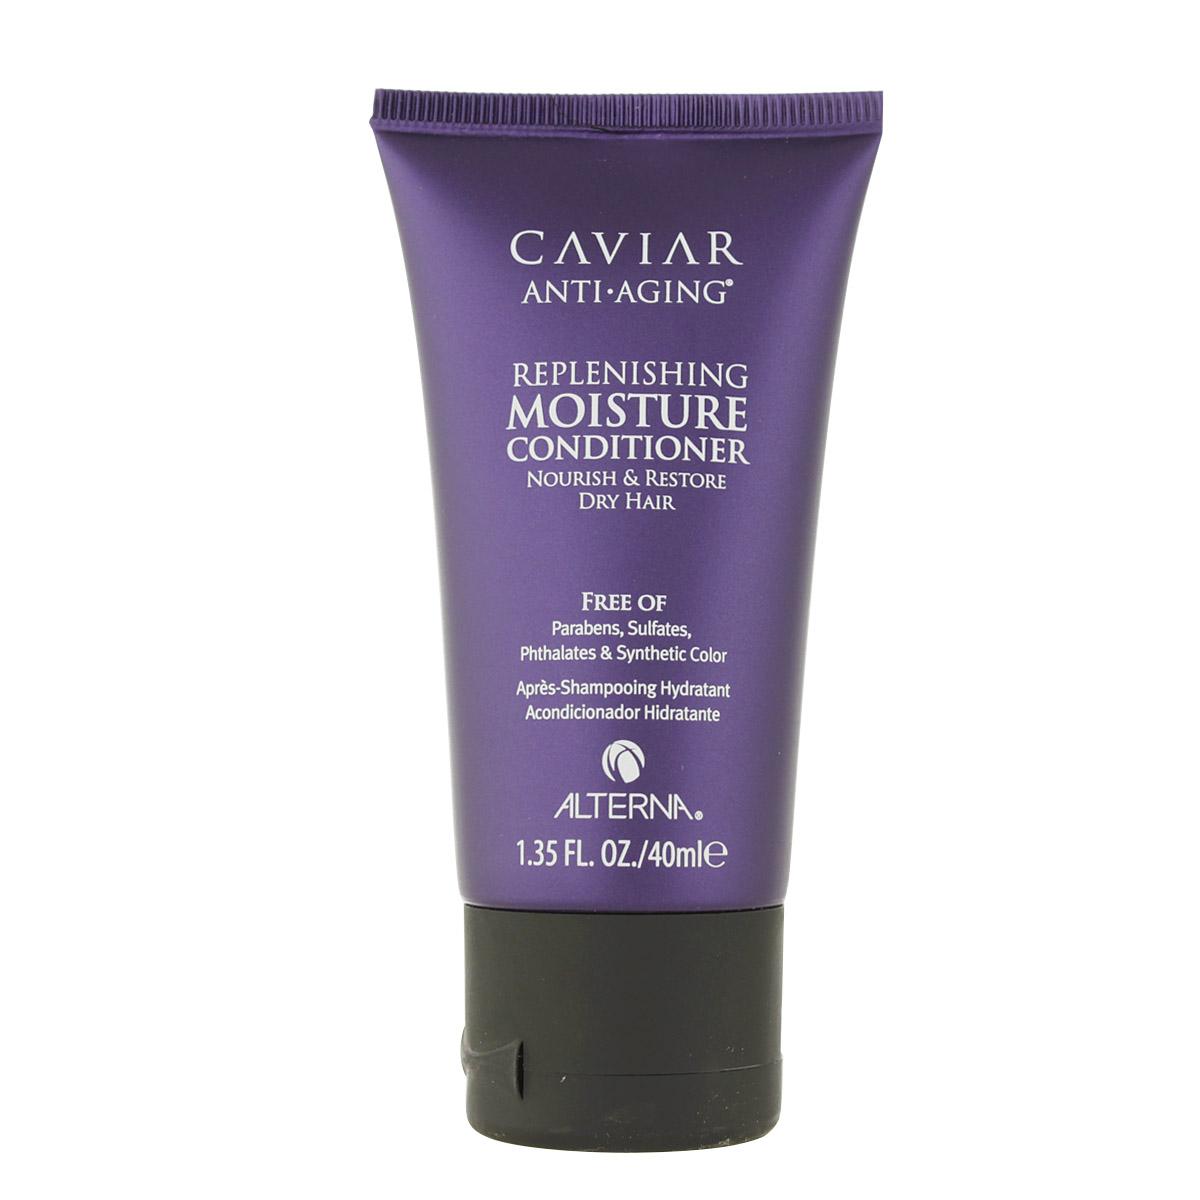 Alterna Caviar Replenishing Moisture Conditioner 40 ml